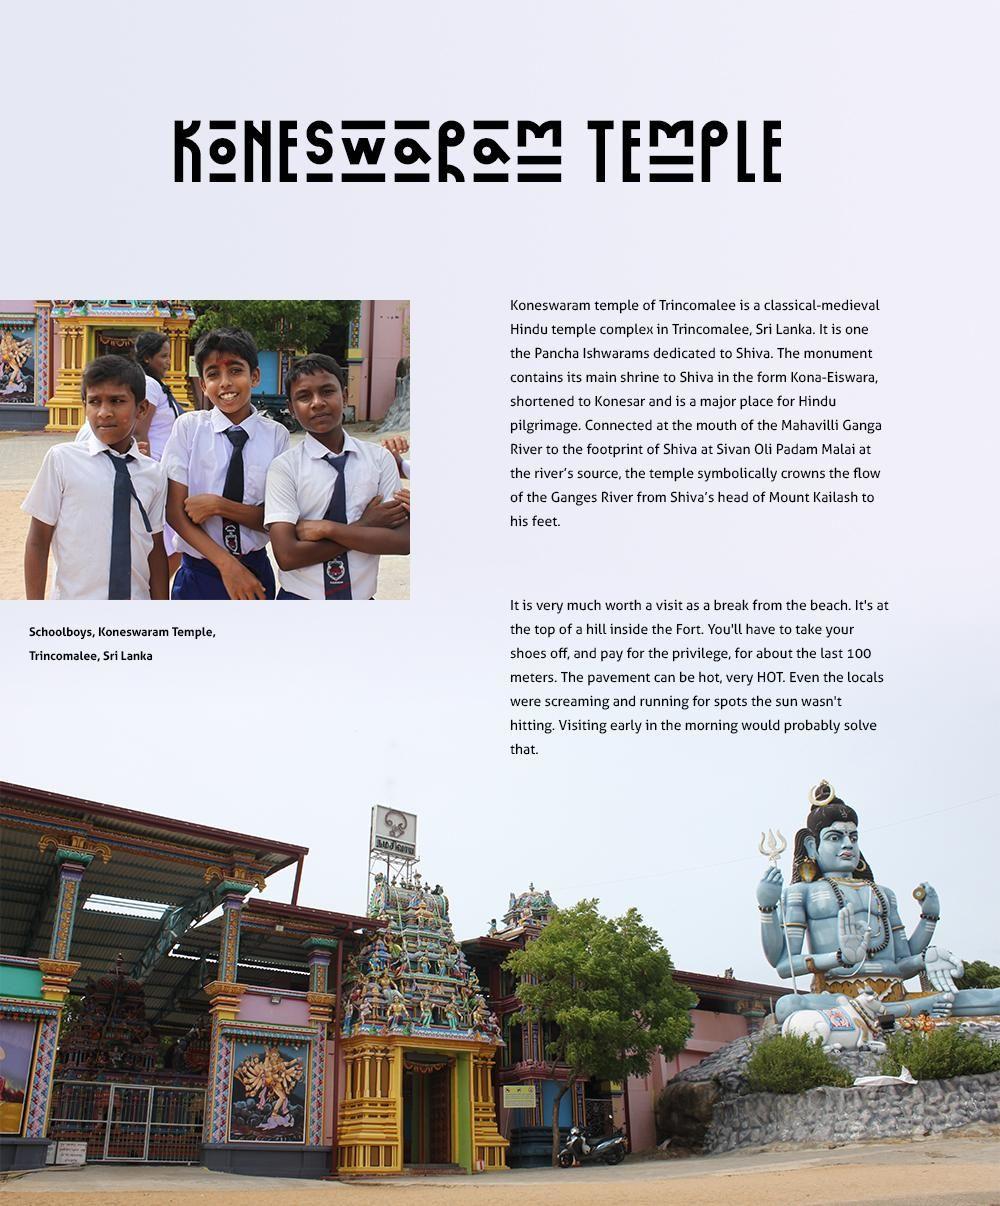 Sri Lanka travel cards - image 2 - student project